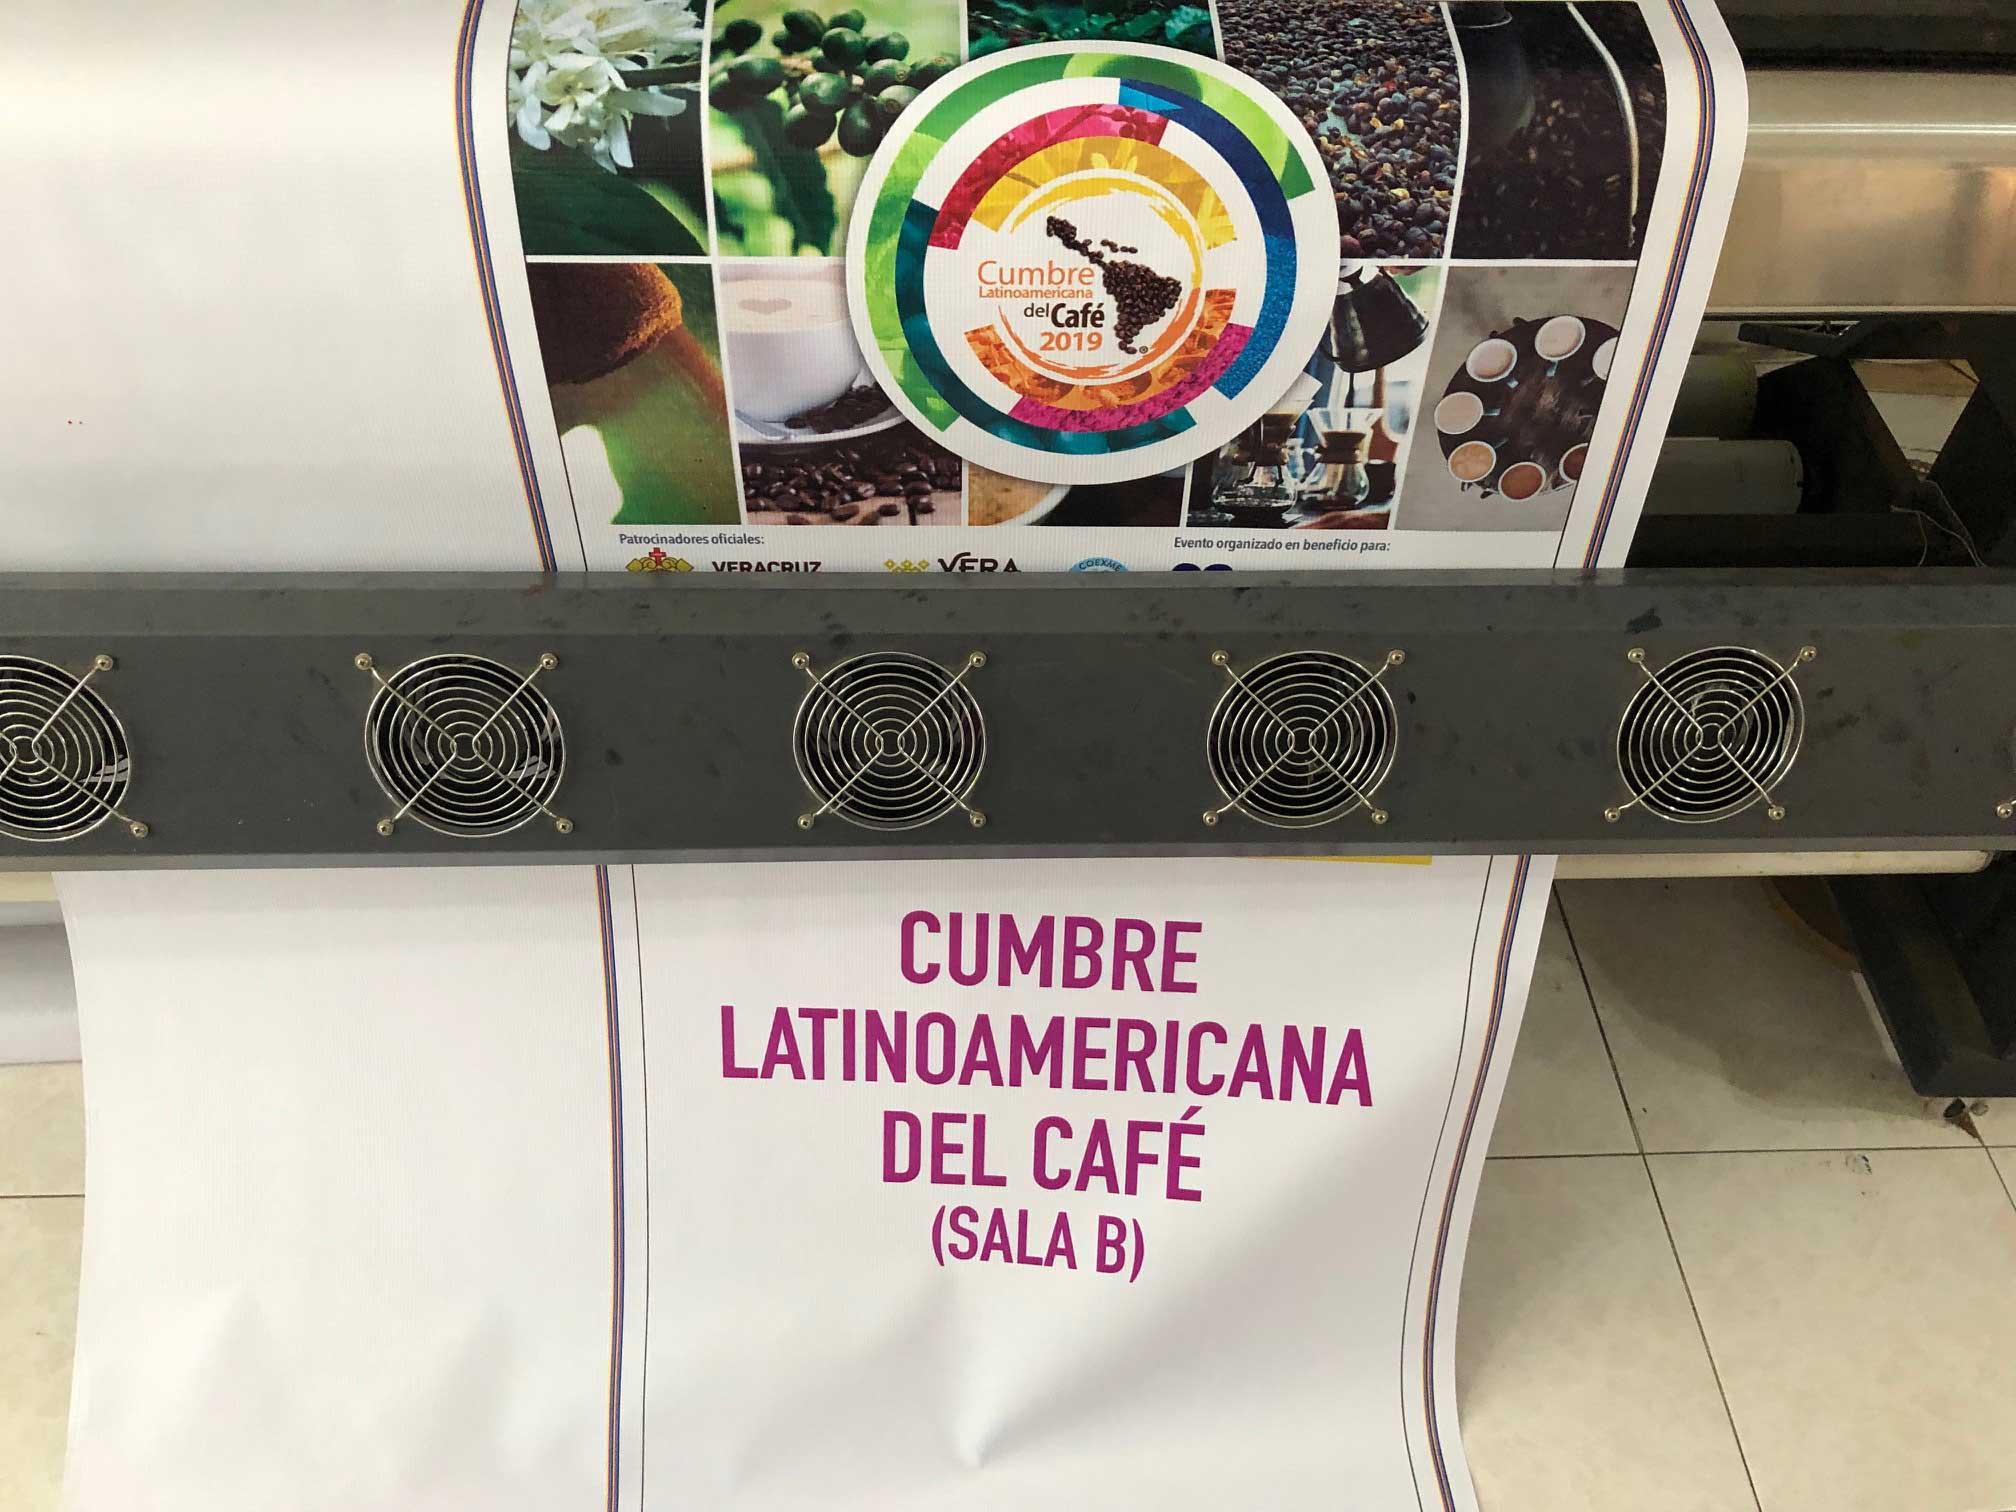 Lona-para-Banners-X-Cumbre-Café2019-3